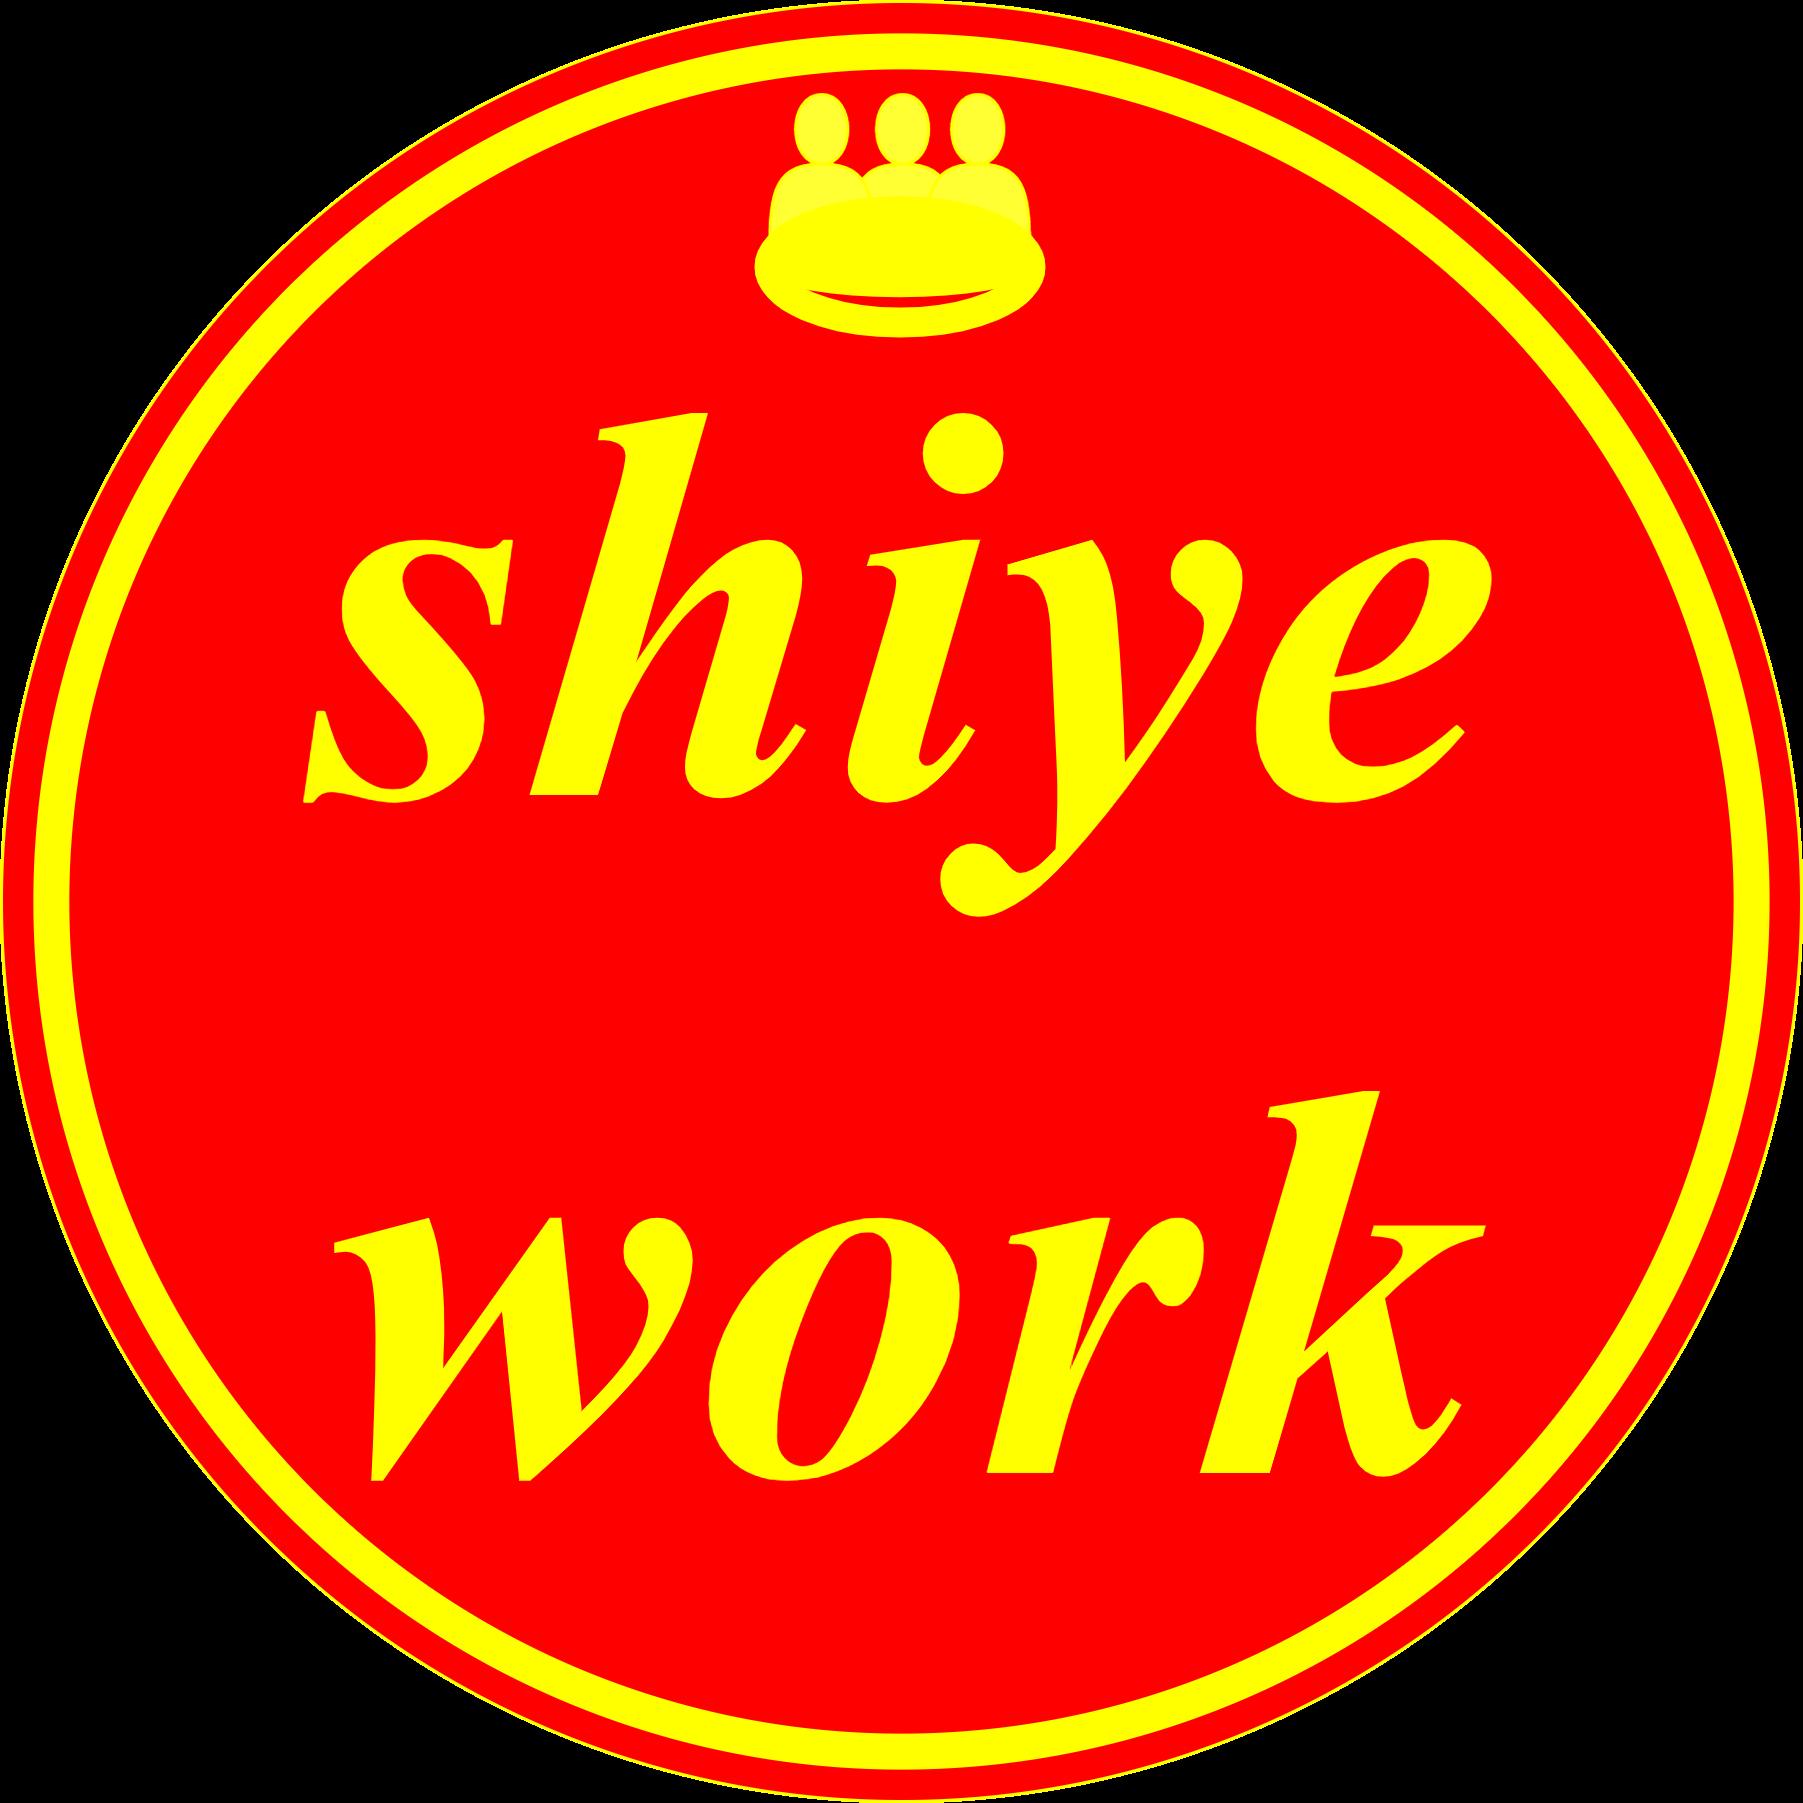 www.shiye.work